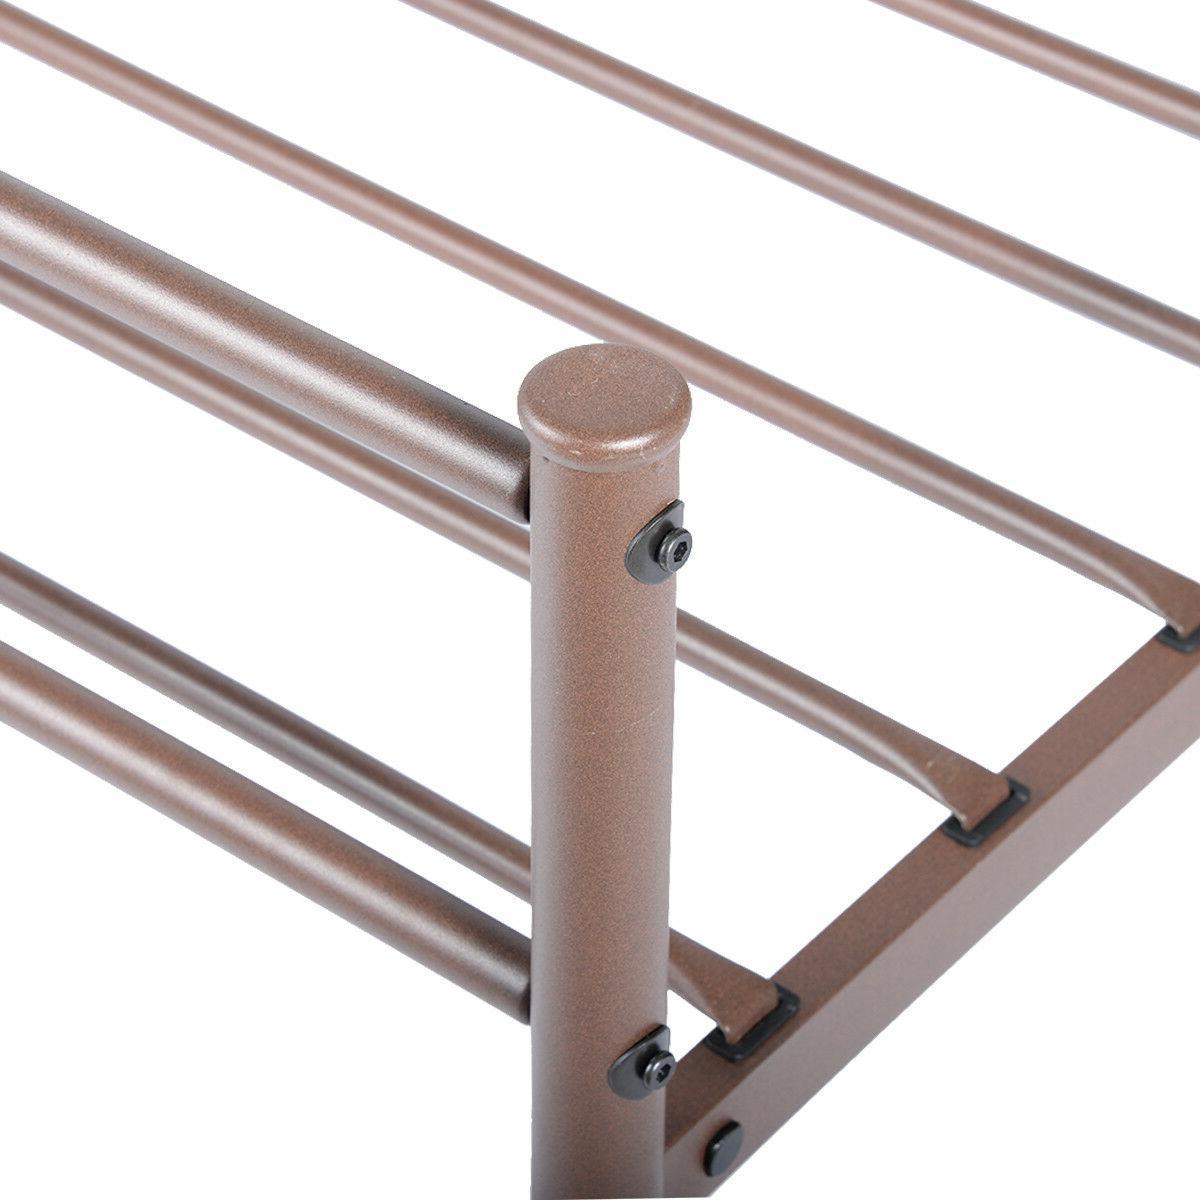 Metal Full Frame Mattress Foundation w/ Headboard and